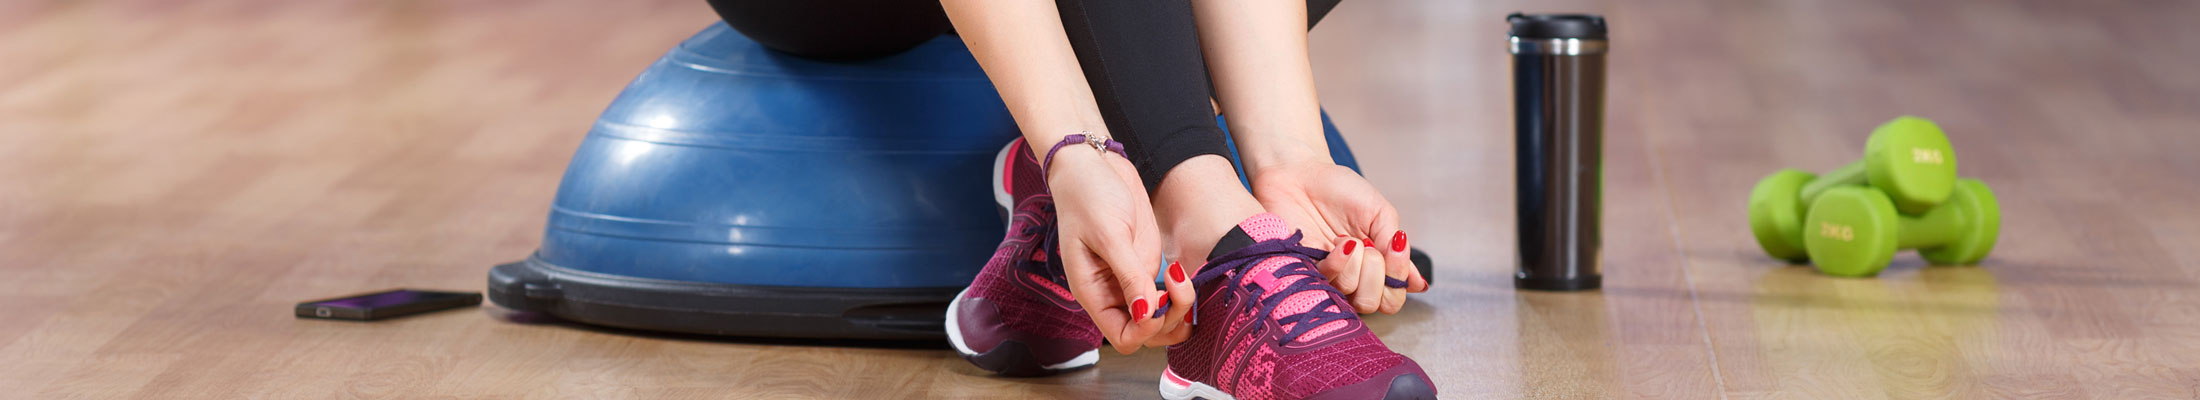 Personal Training bei fitness-konzept